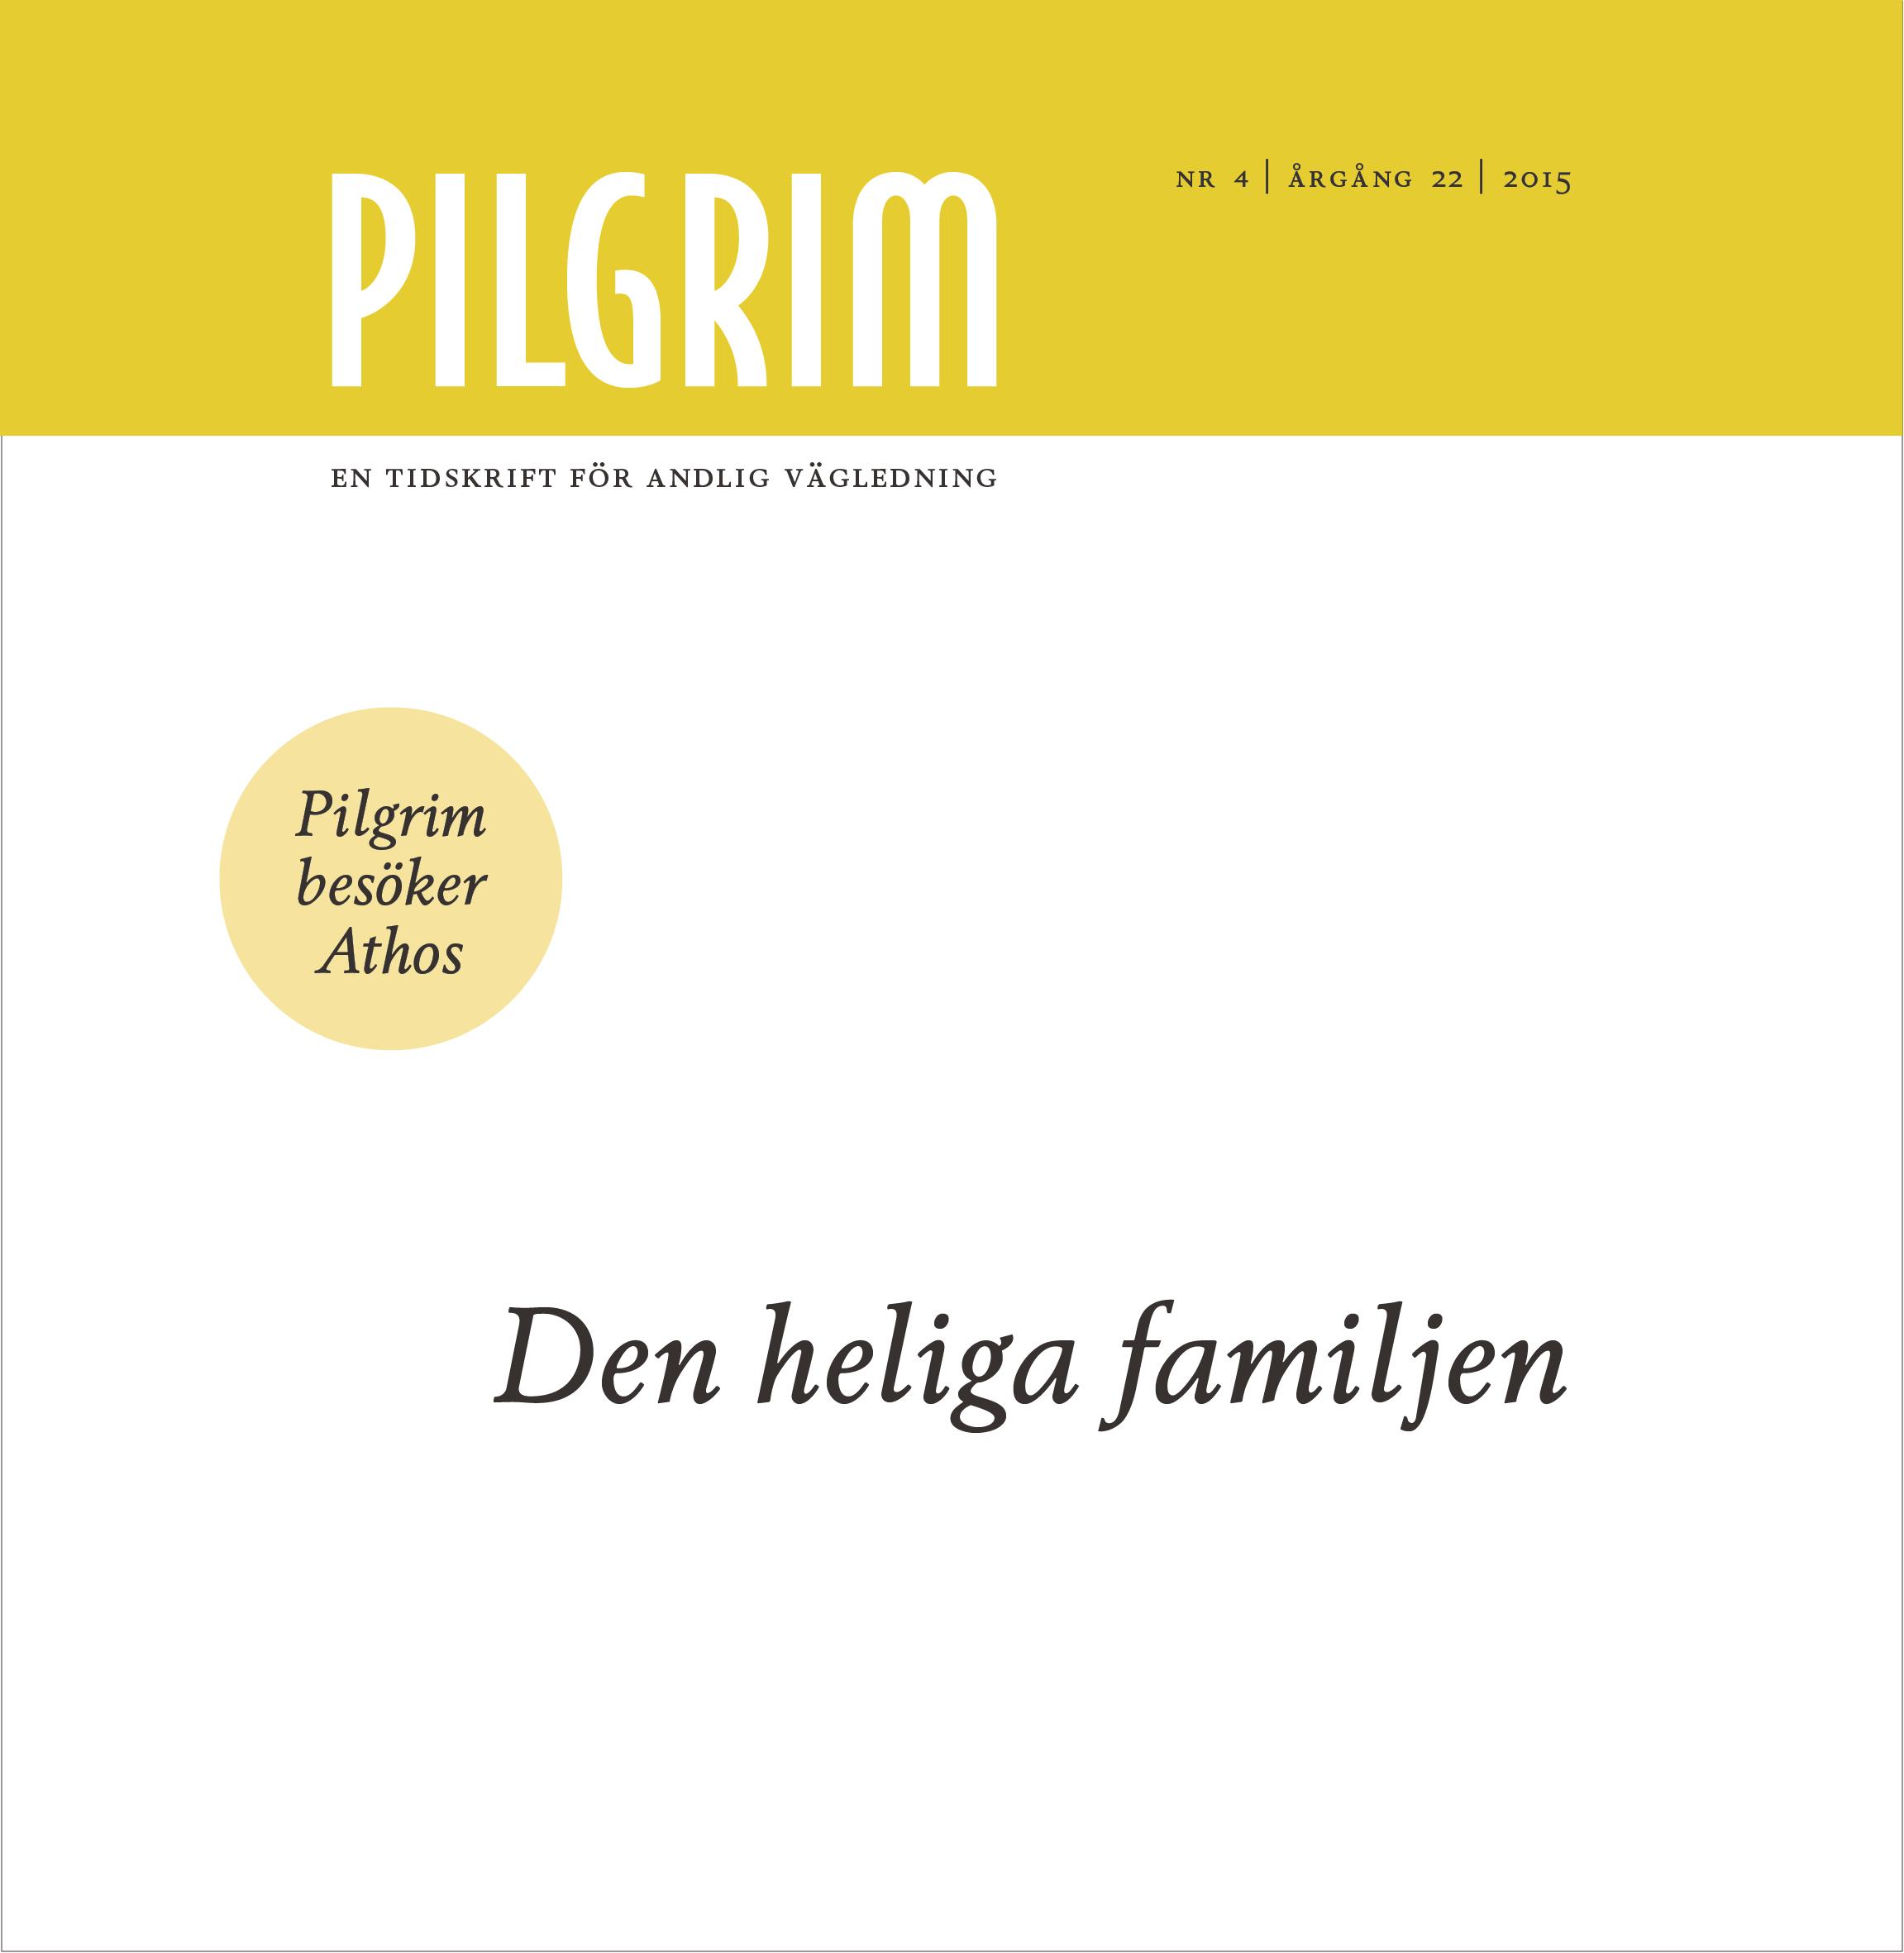 Pilgrim frams 2015-4